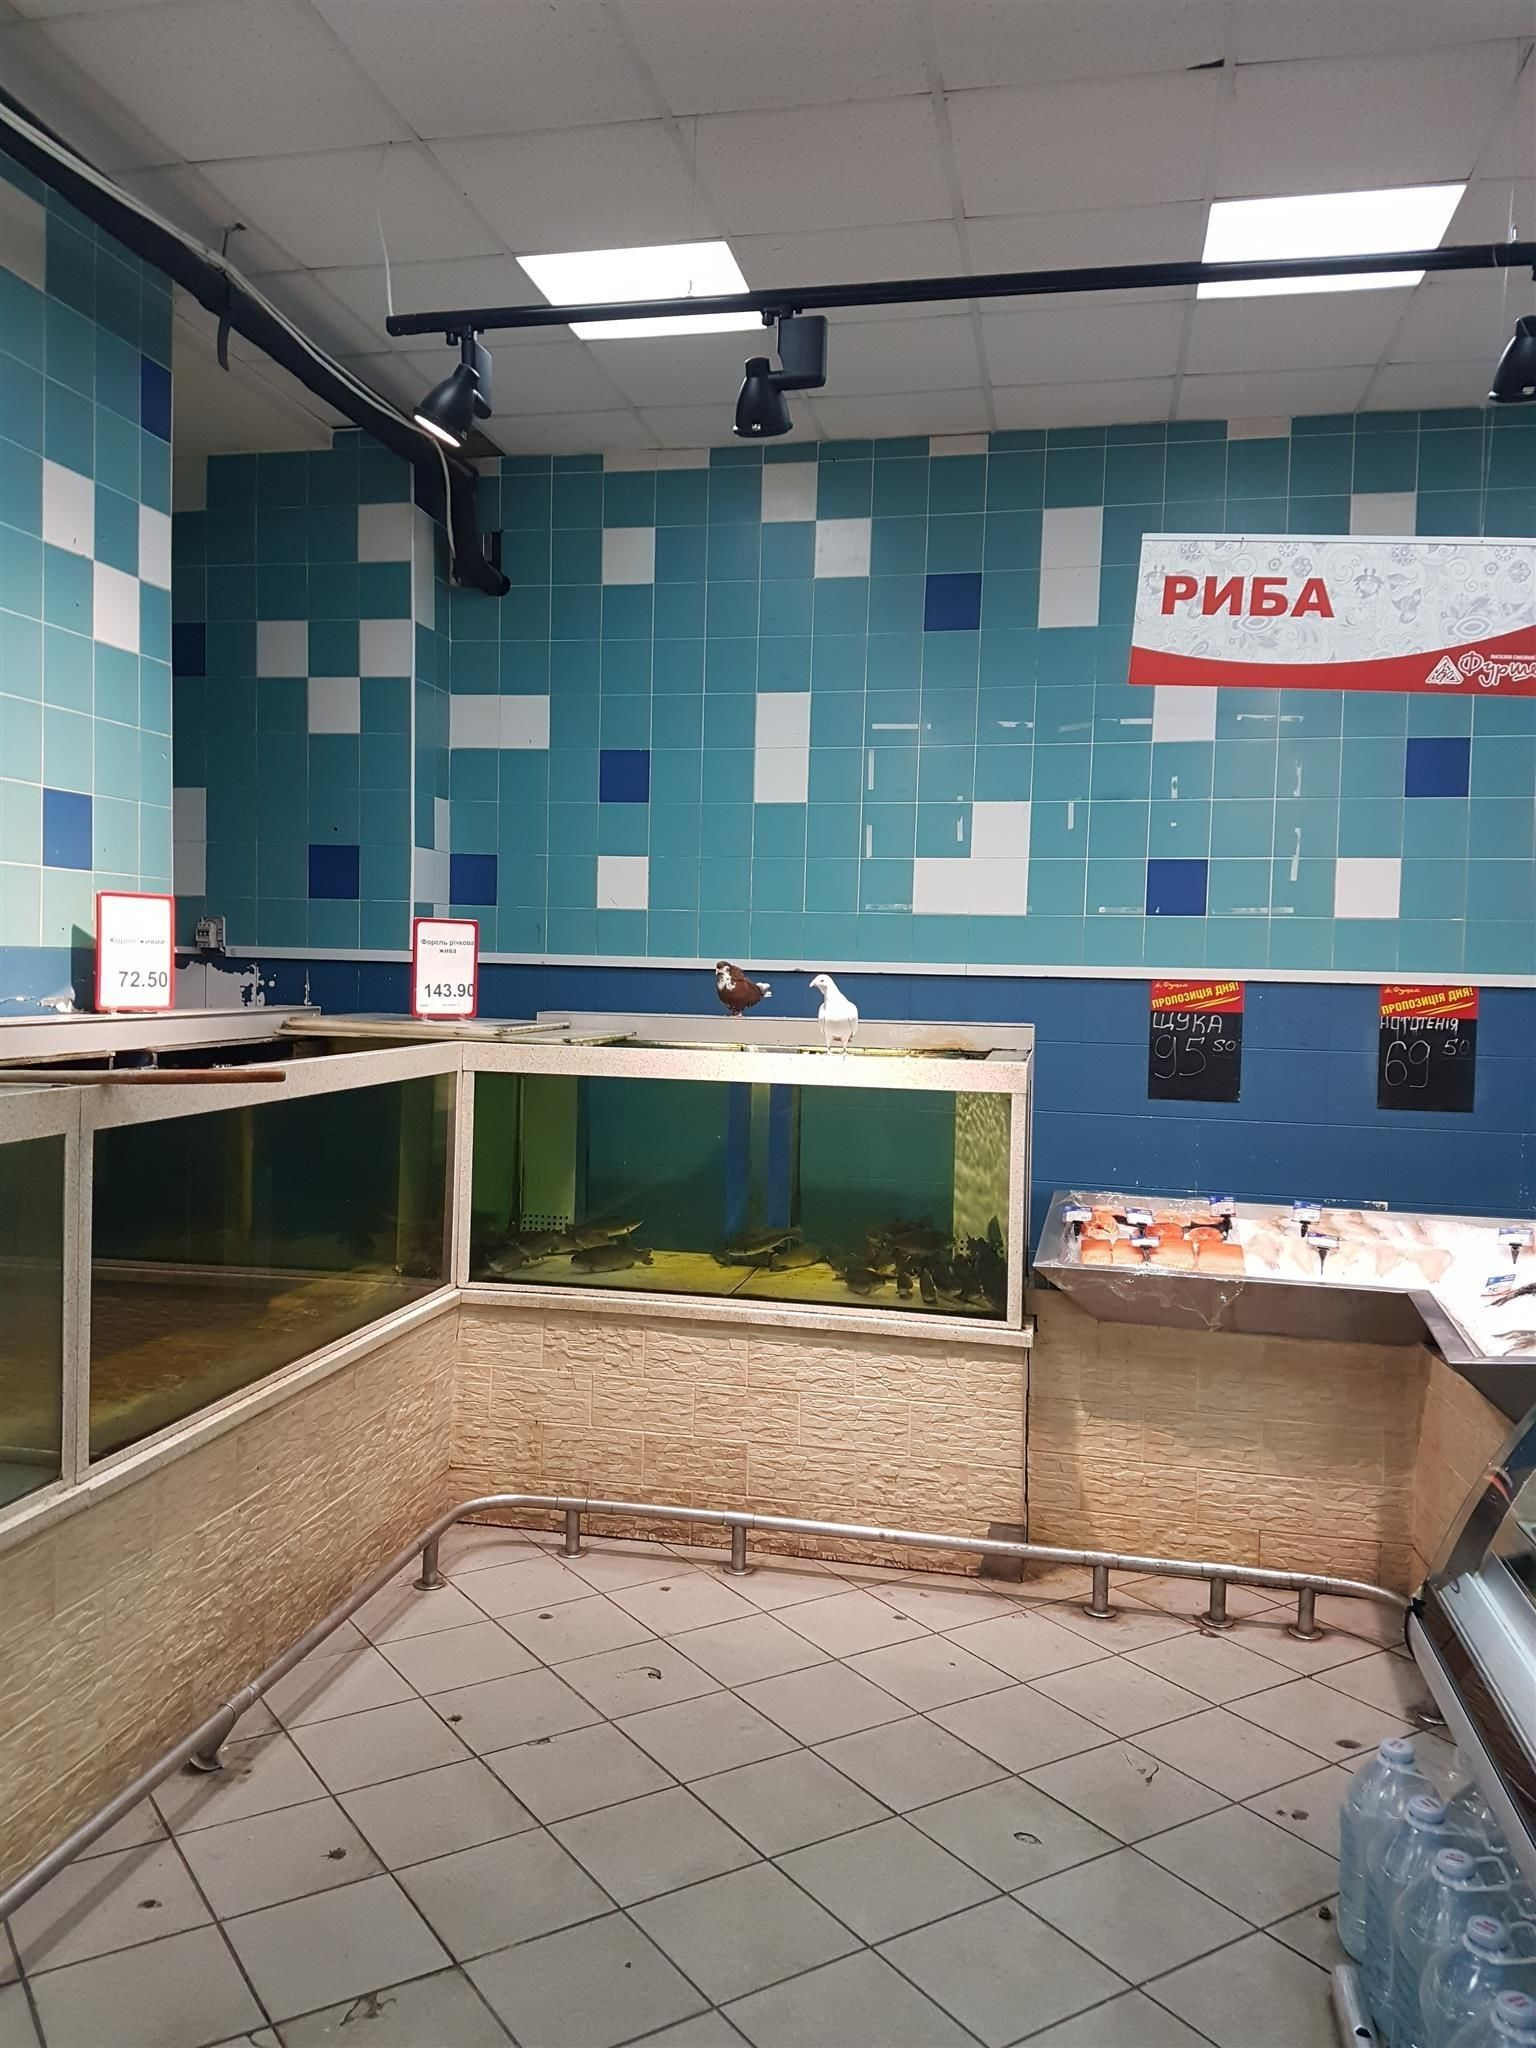 Голуби выглядят живую рыбу в аквариуме / фото ТСН